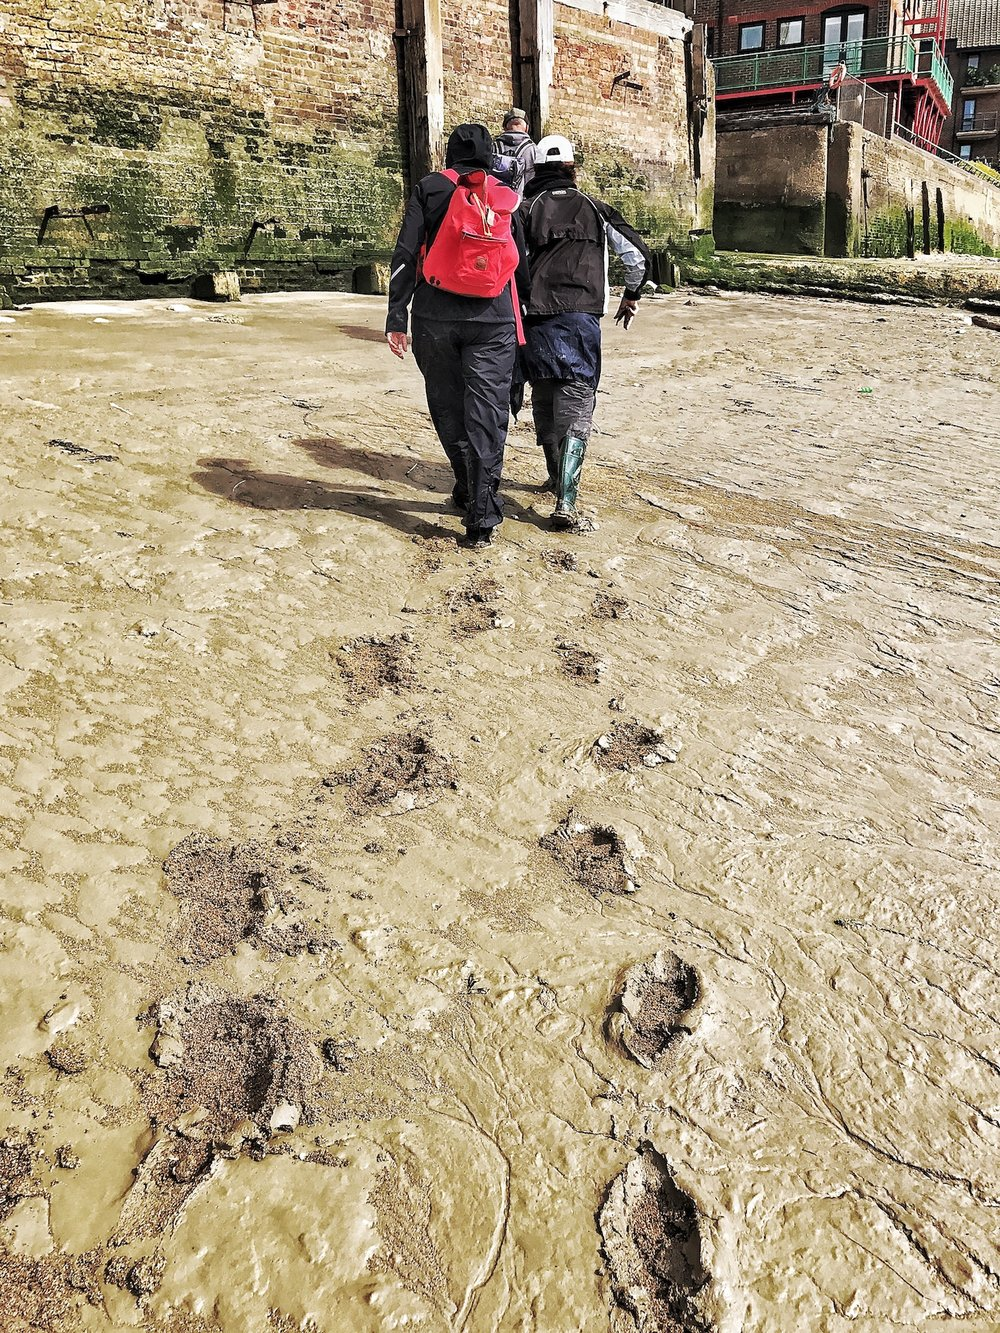 Walking Away leaving Footprints. Low Tide. The River Thames. Mudlarking